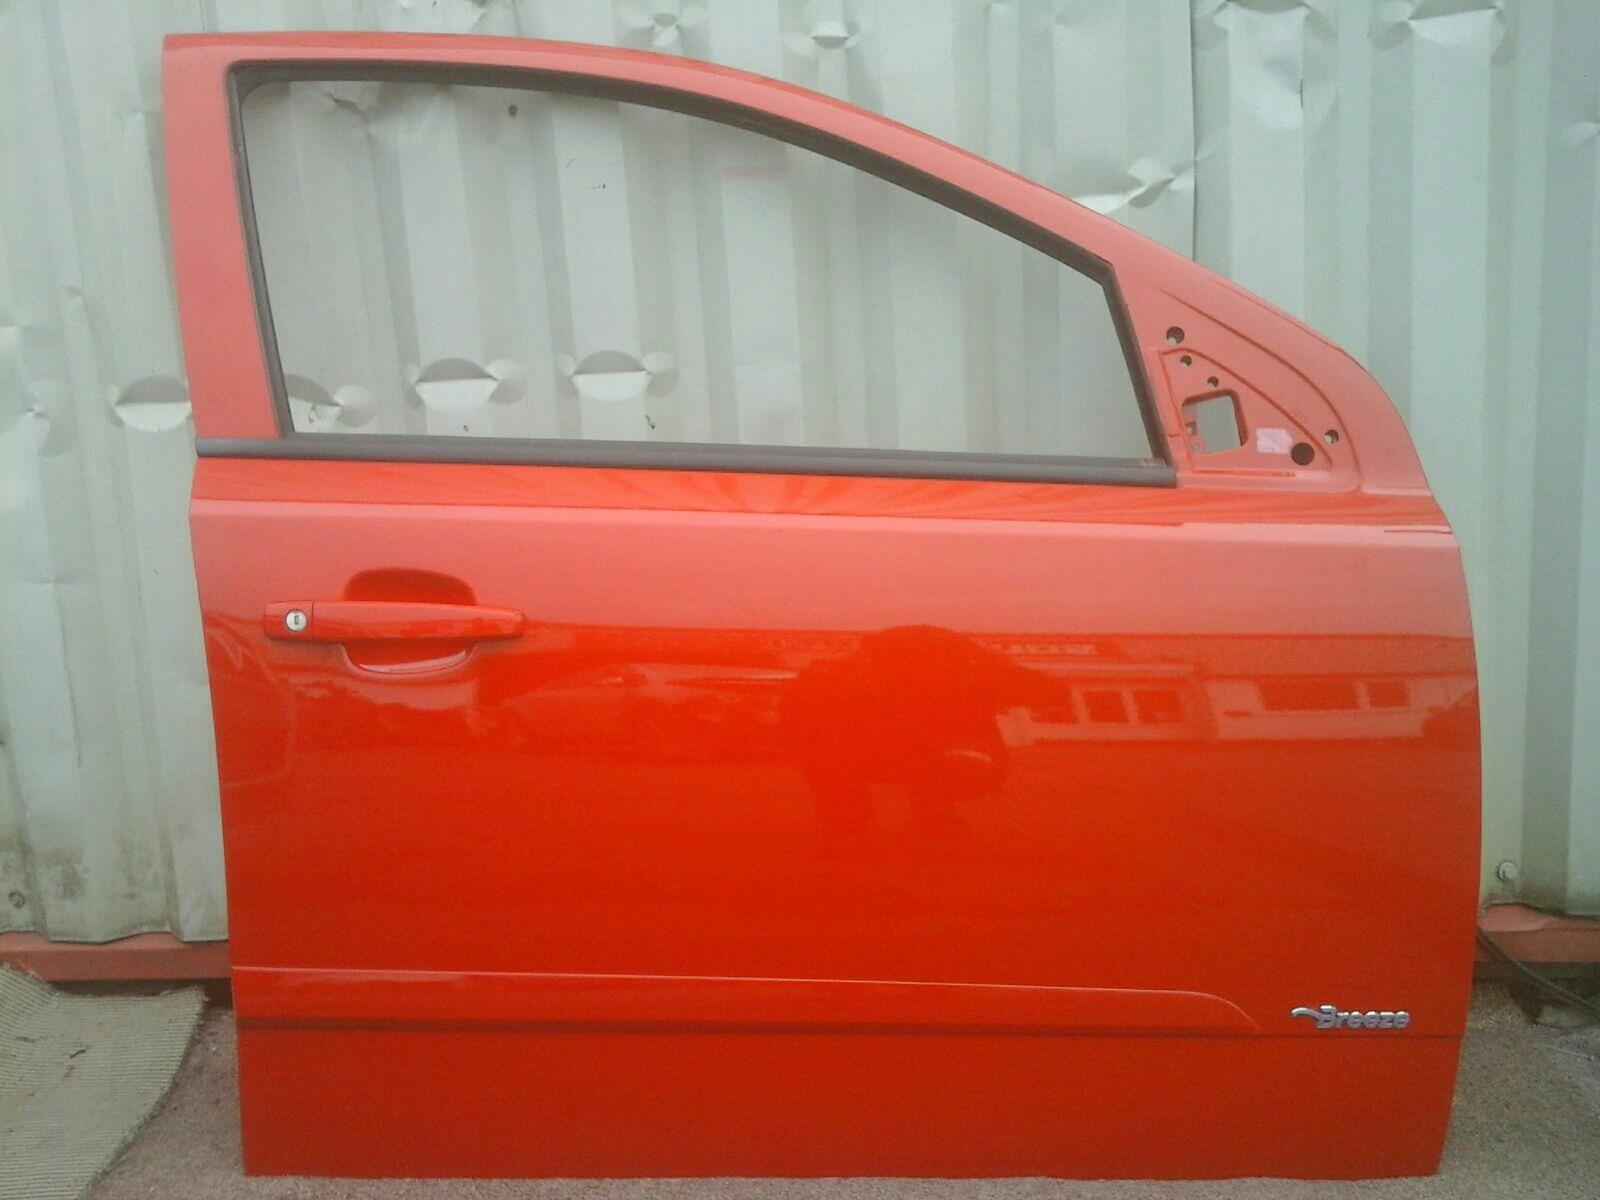 VAUXHALL ASTRA H MK5 VAN ESTATE REAR BACK LIGHT O//S DRIVERS SIDE 2004-2010